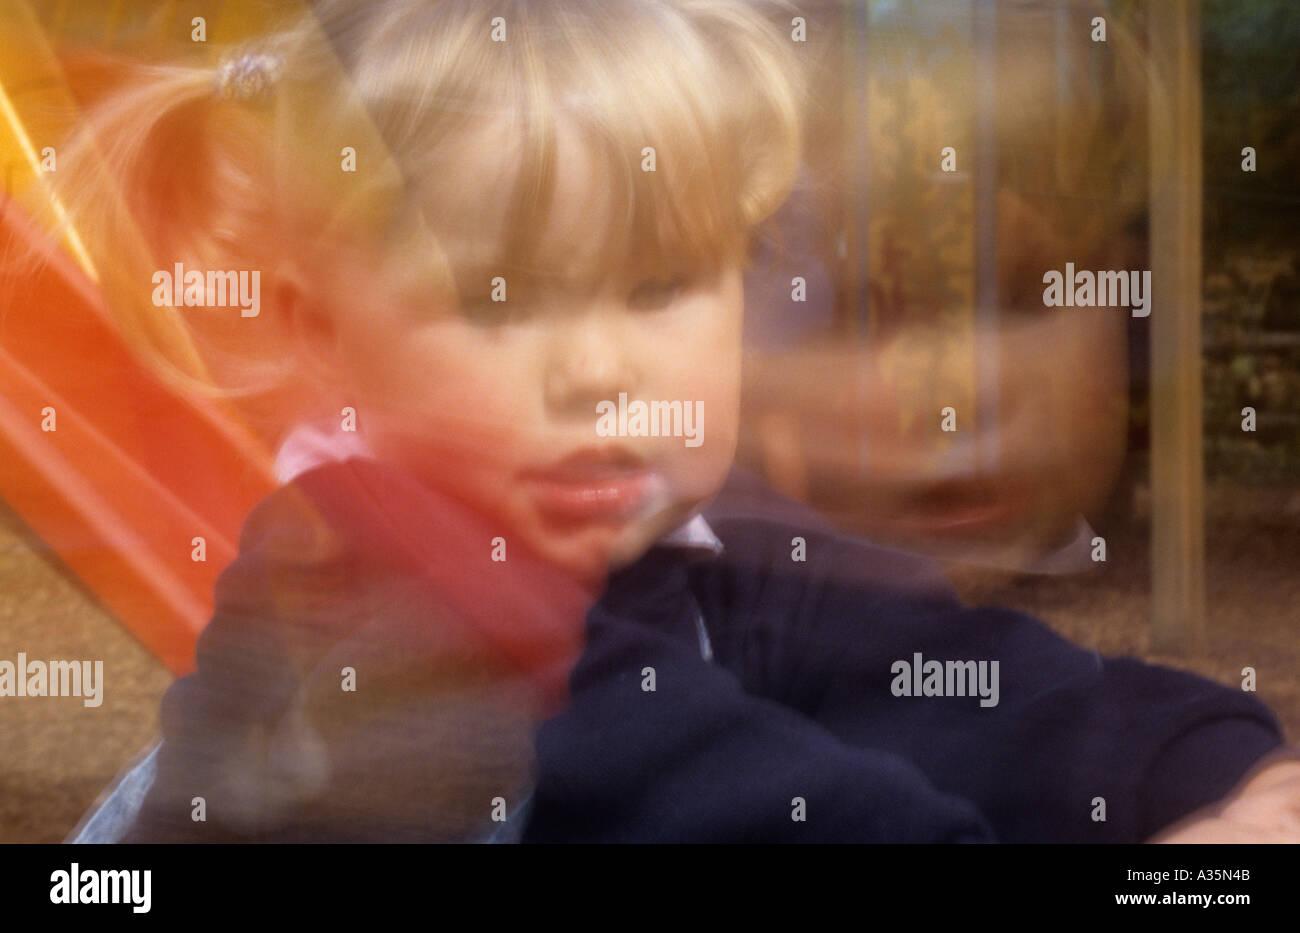 Small child uk - Stock Image